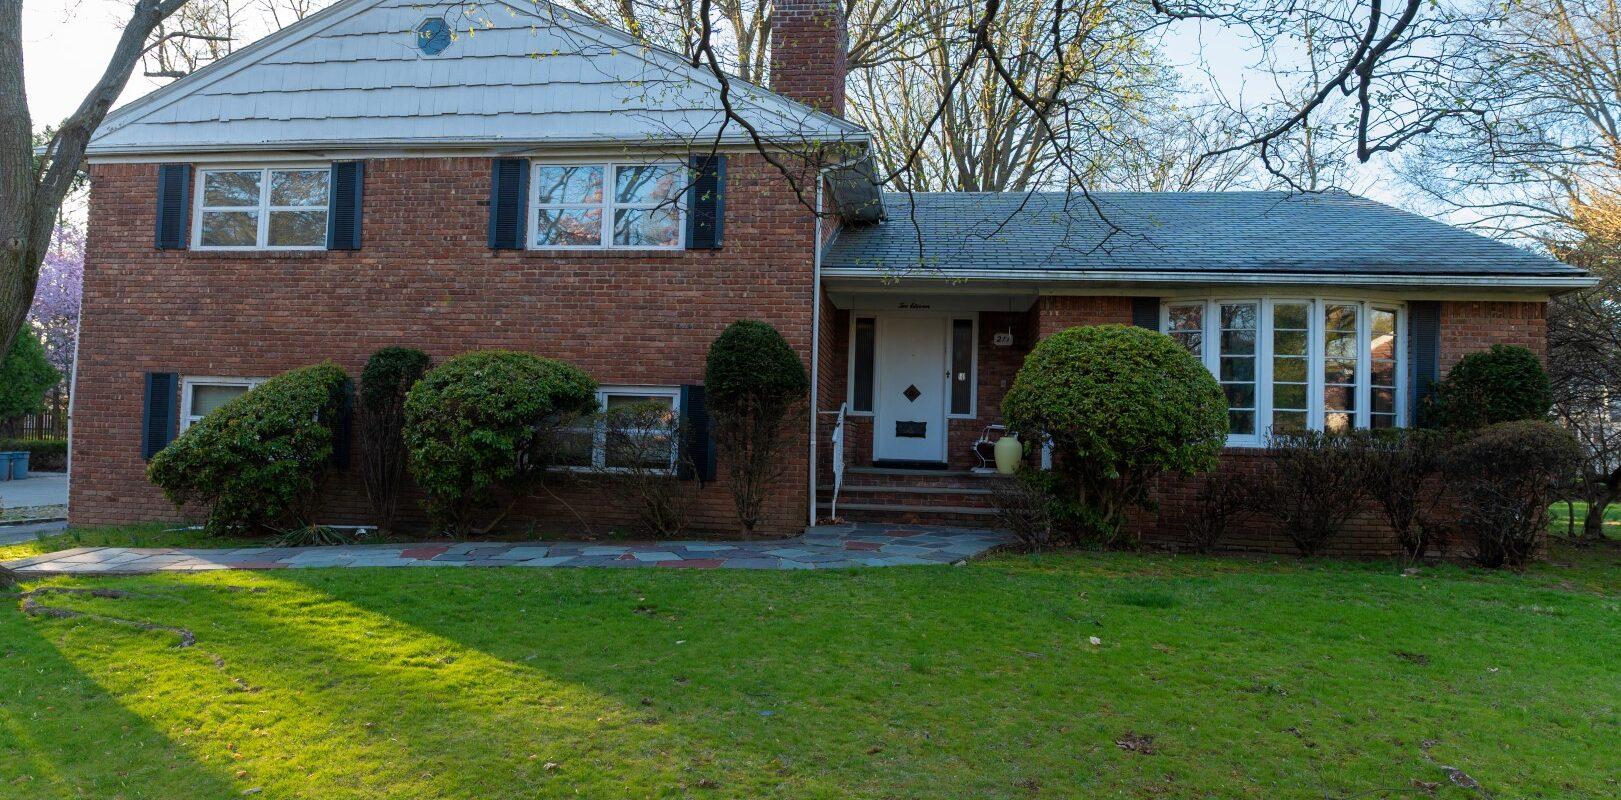 211 Surrey Rd.,  Hillside,  NJ 07205